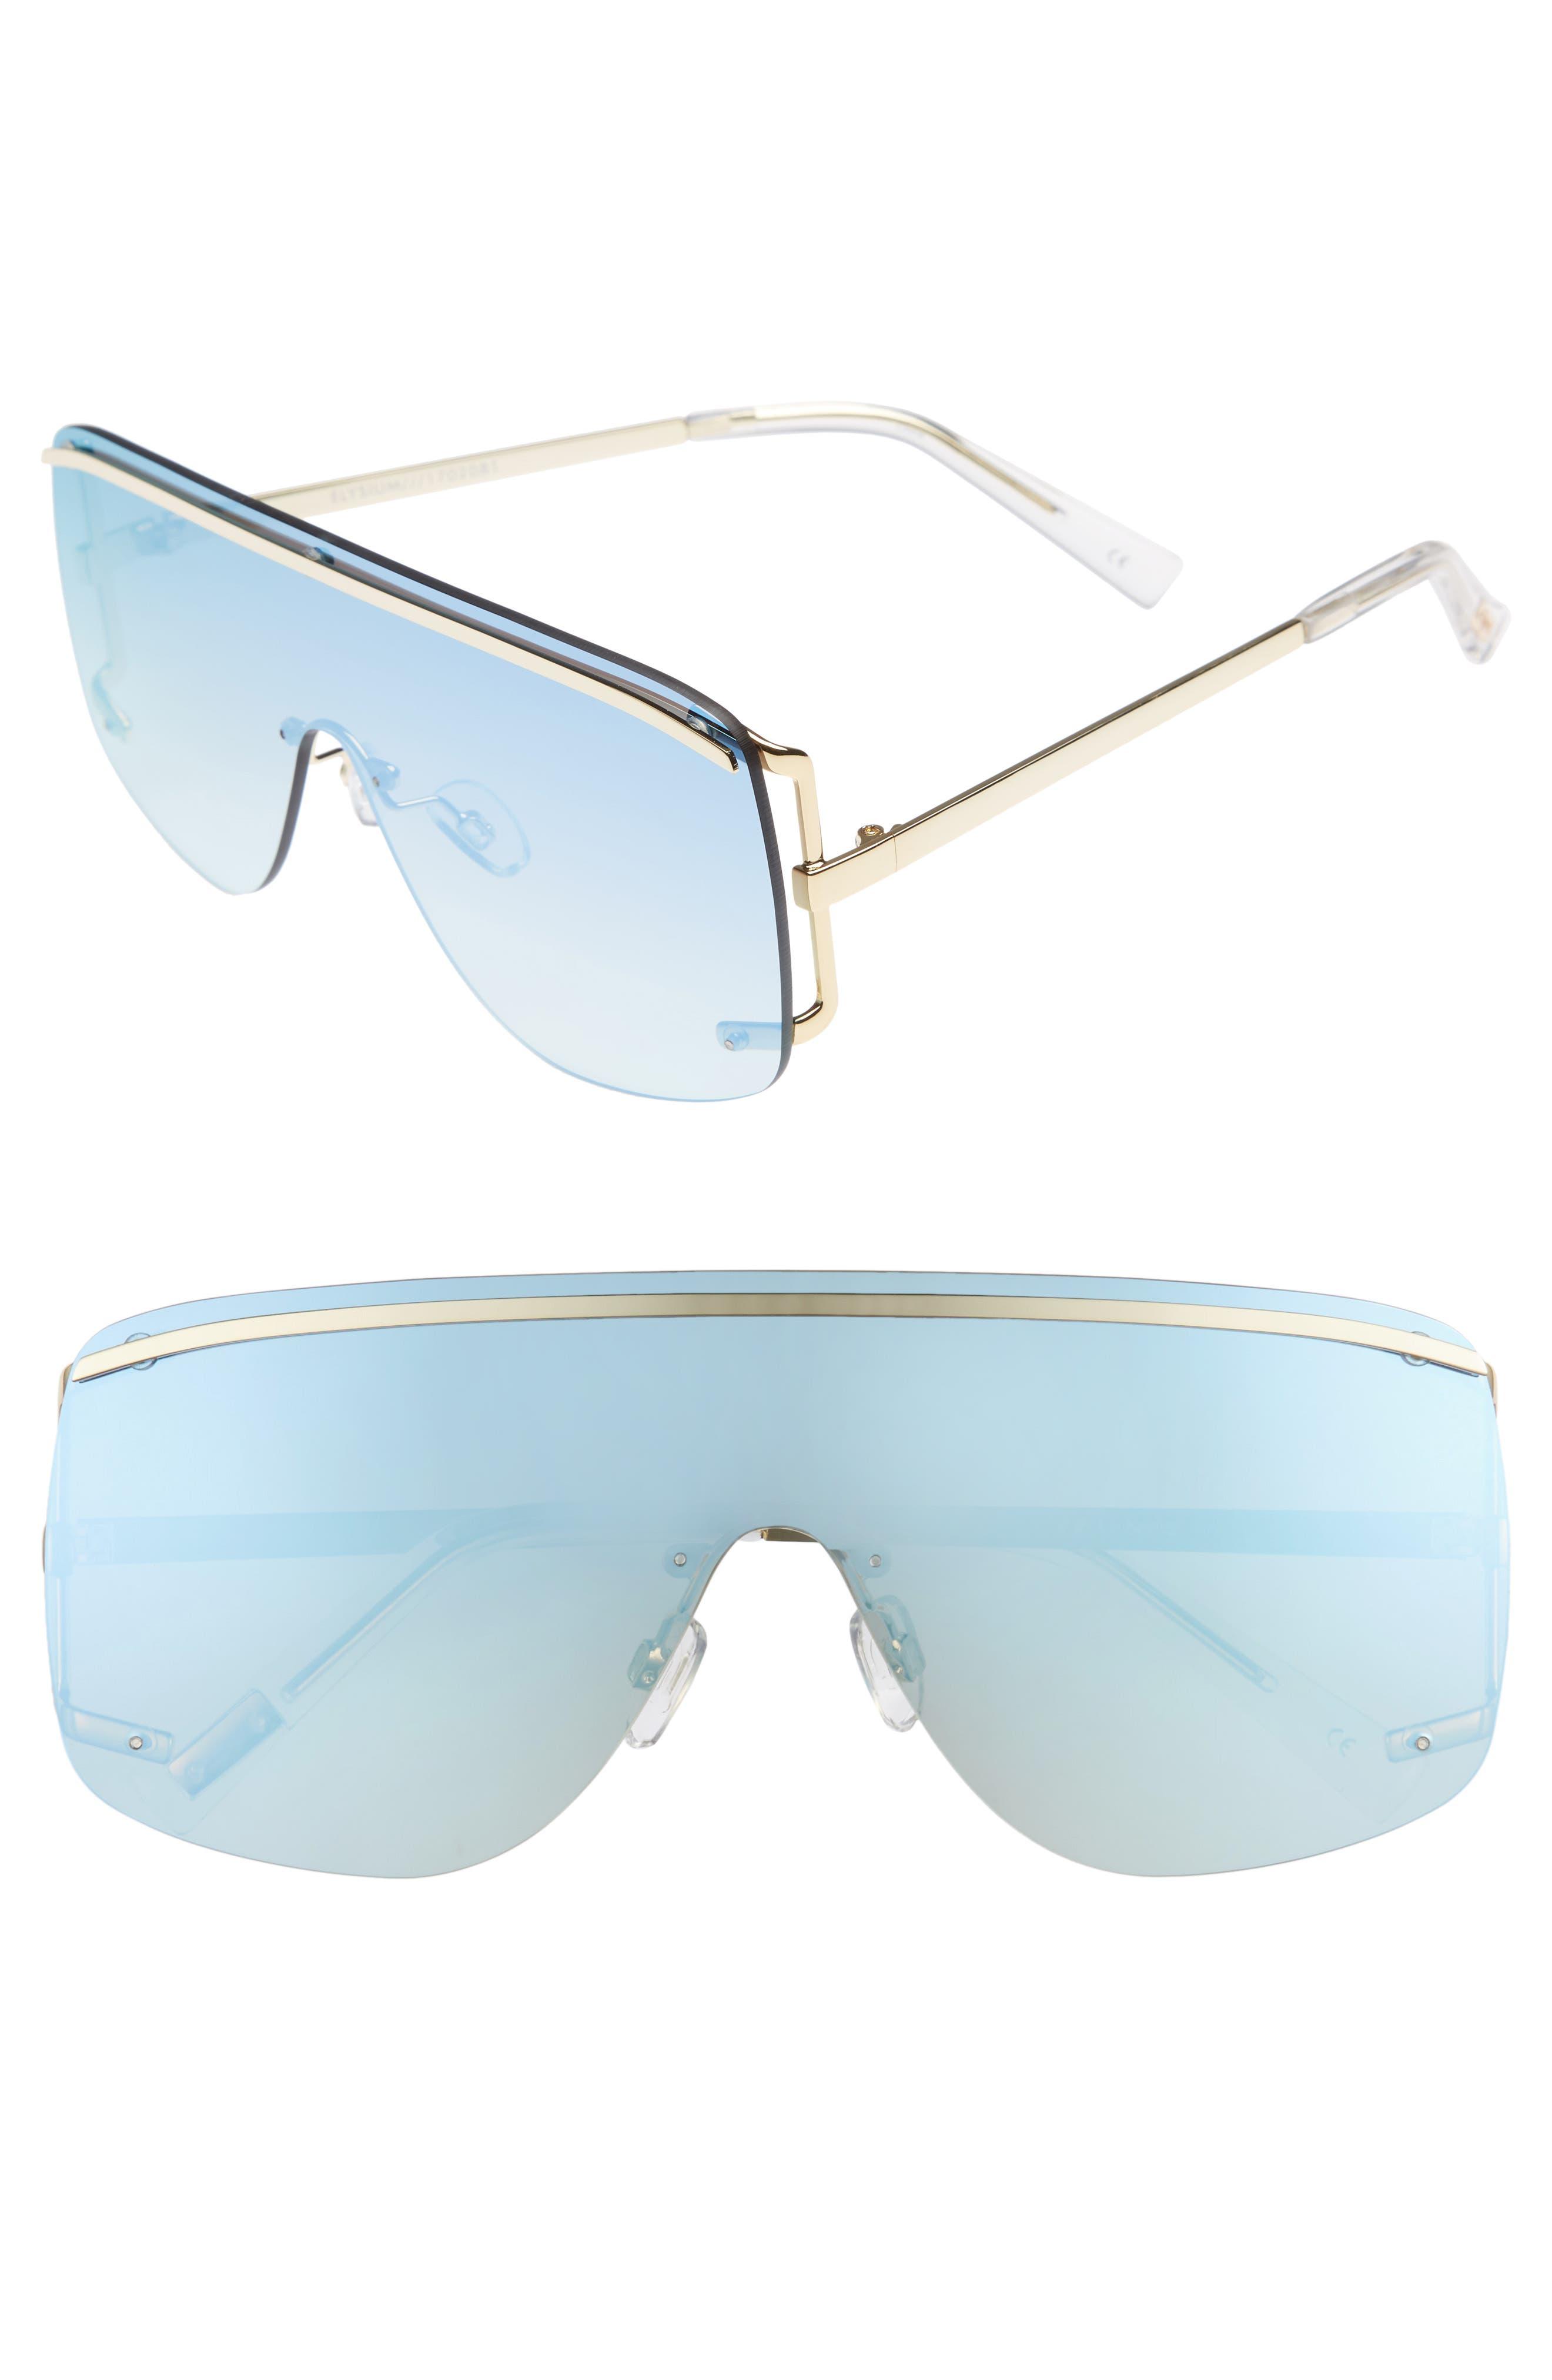 Elysium 140mm Shield Sunglasses,                         Main,                         color, Bright Gold